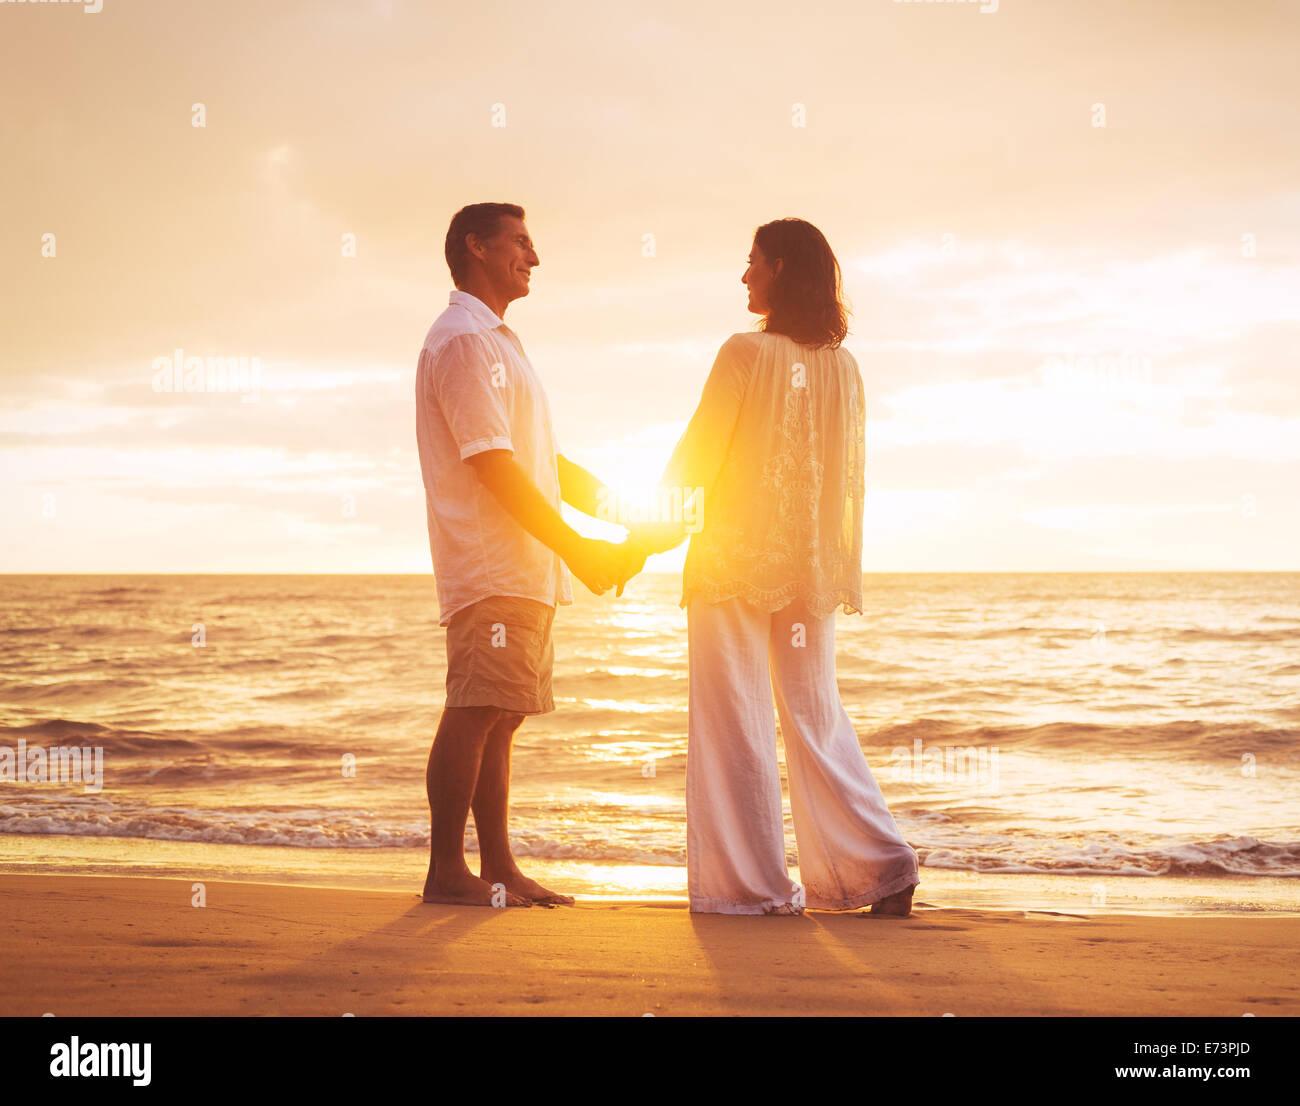 Romantische älteres paar Sonnenuntergang am Strand genießen Stockfoto